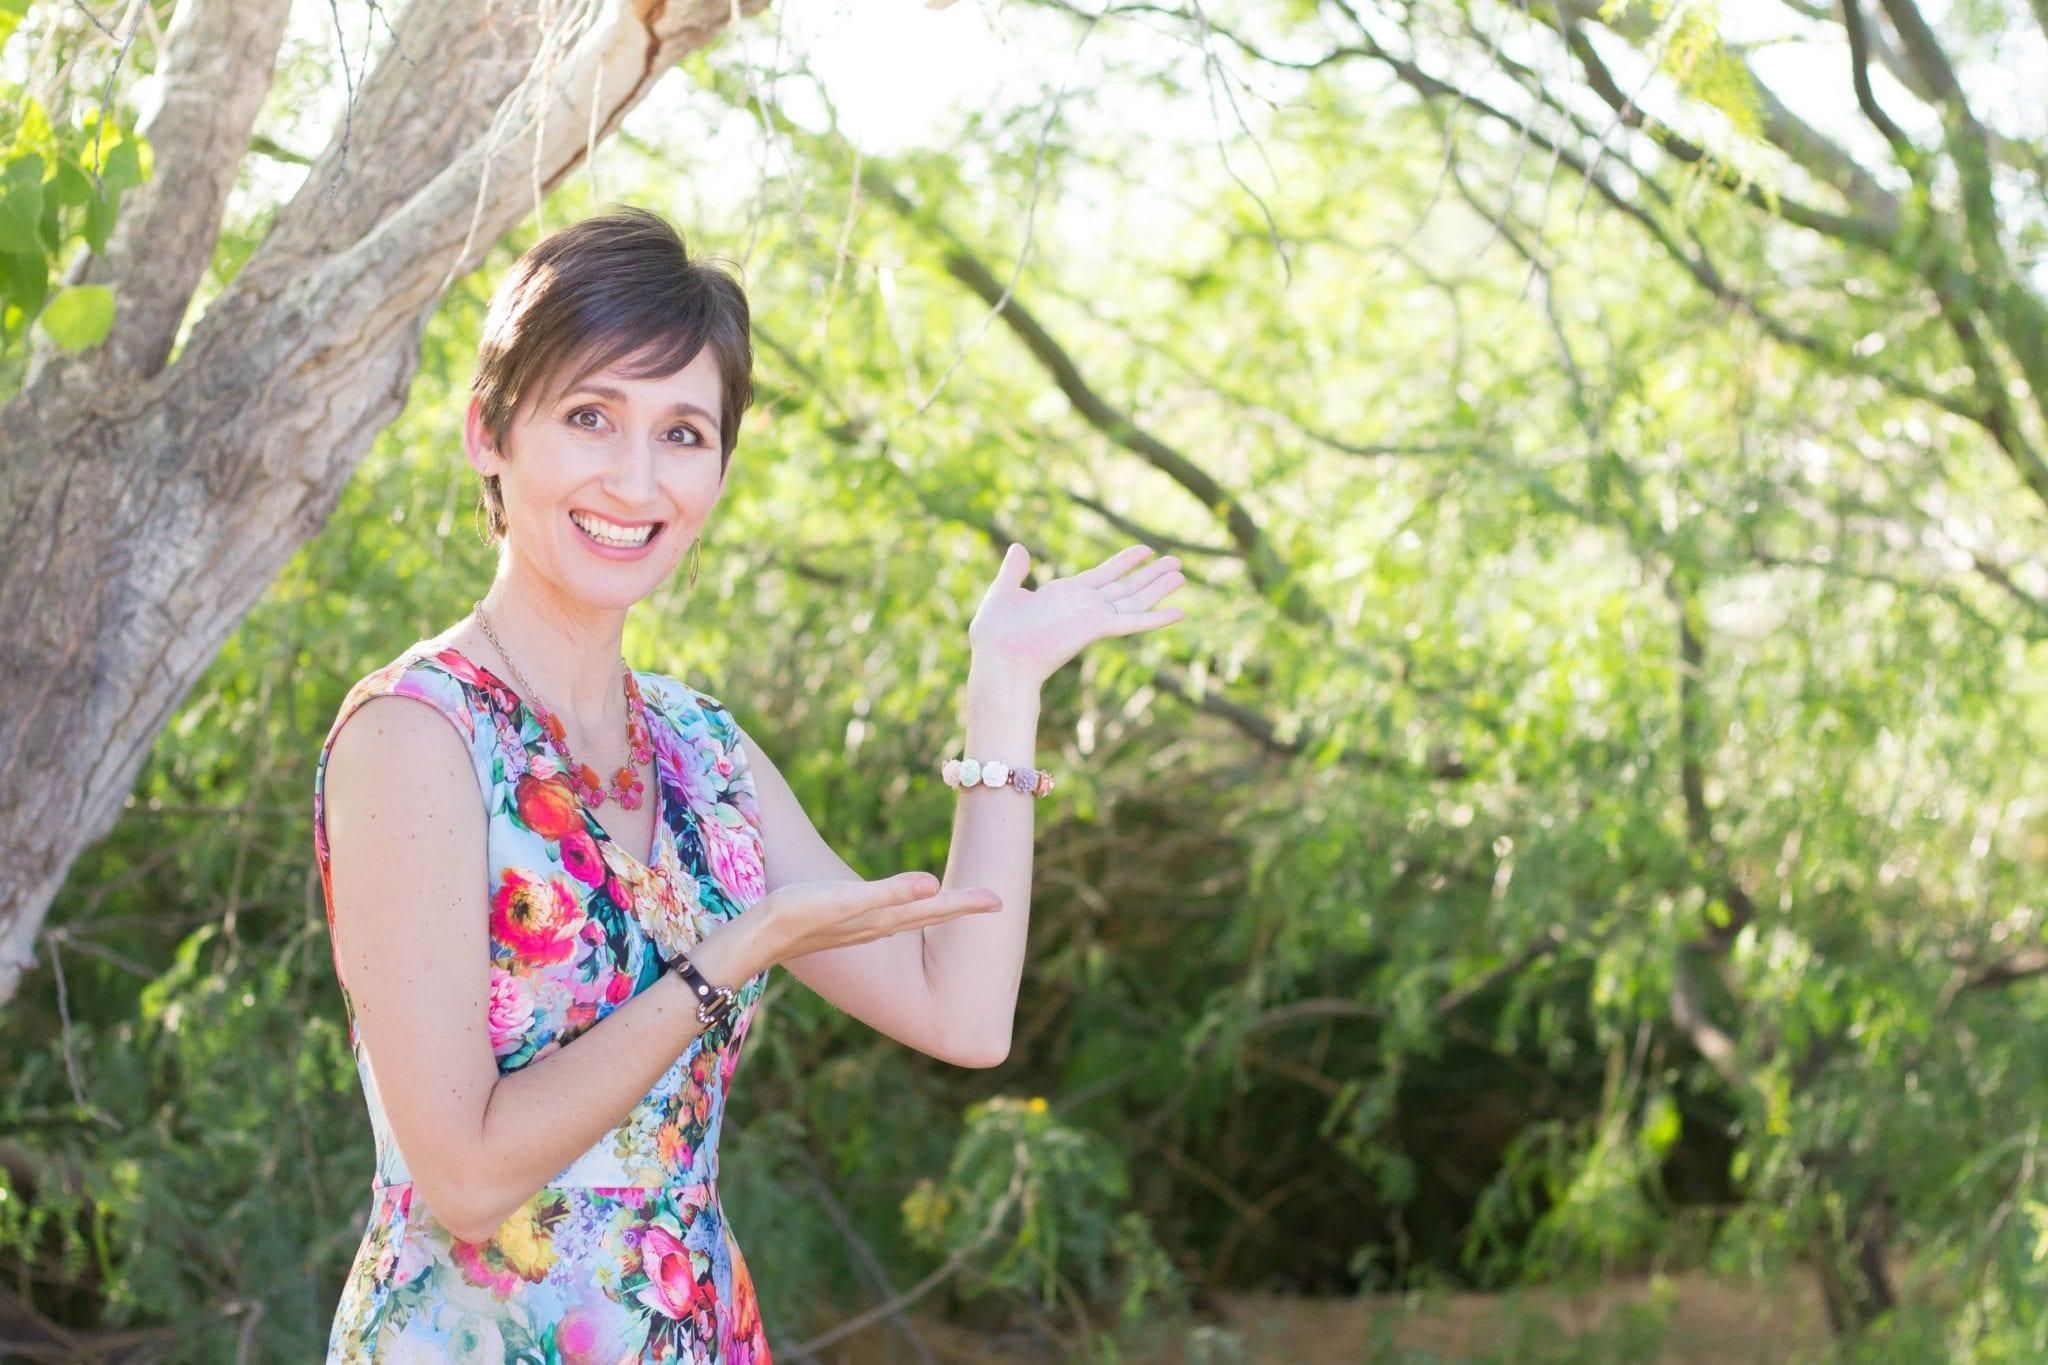 Tips for beautiful head shots from Tabitha Dumas Phoenix Image Consultant